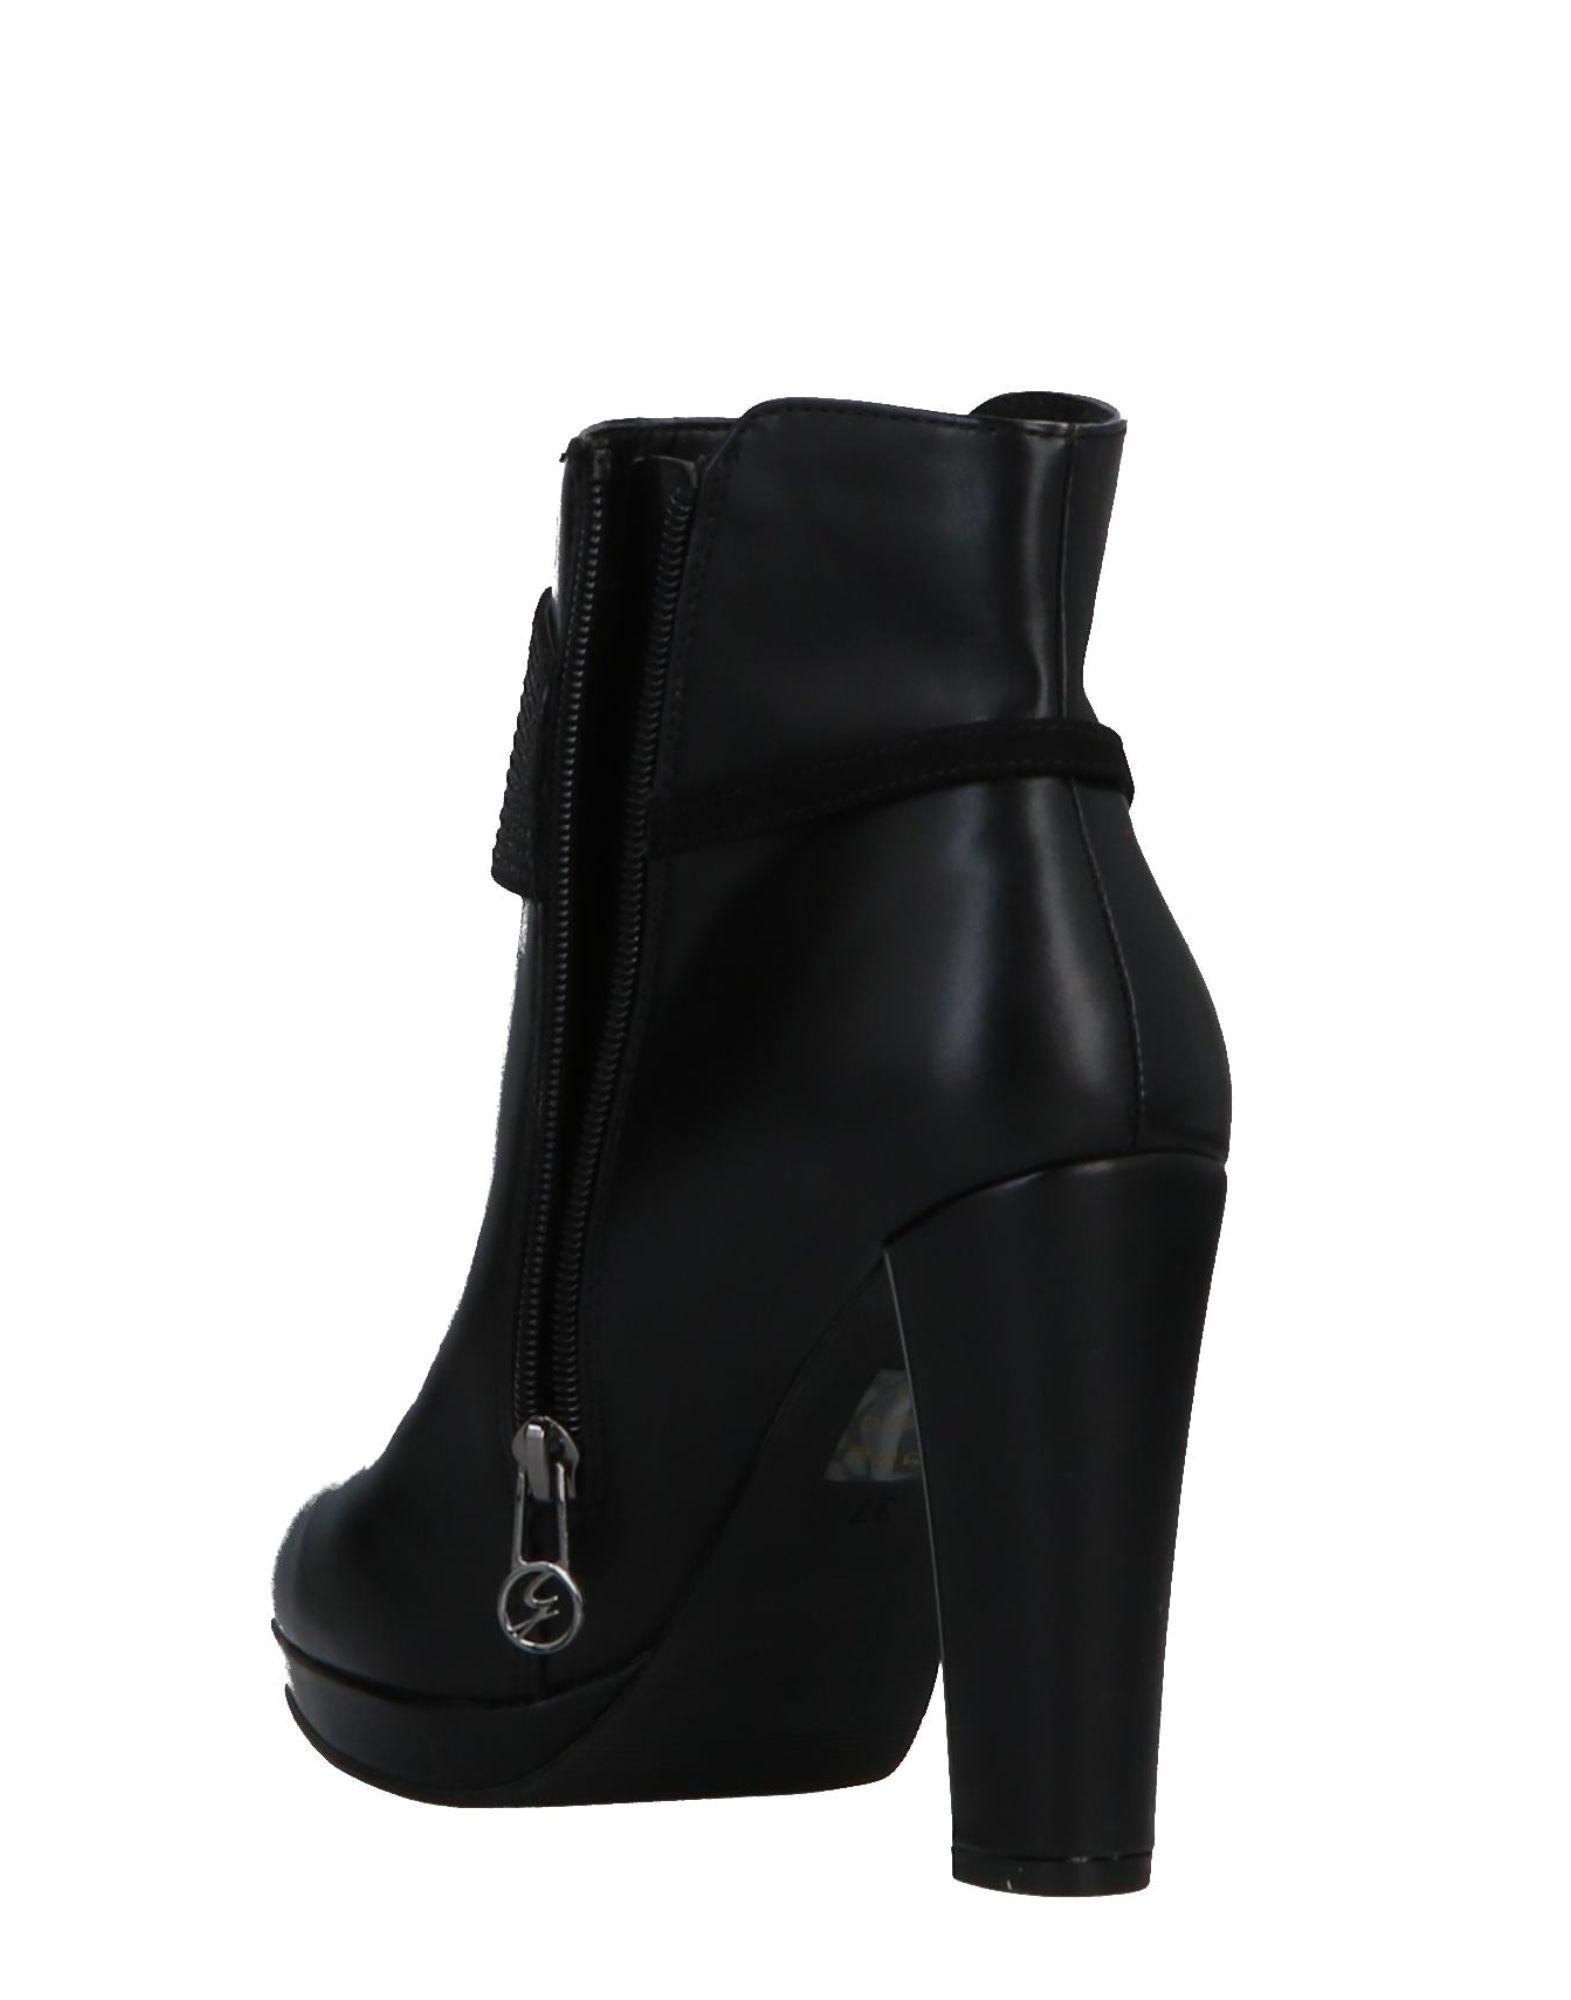 Gattinoni Stiefelette Damen  11517273RV Schuhe Gute Qualität beliebte Schuhe 11517273RV 44e6ba